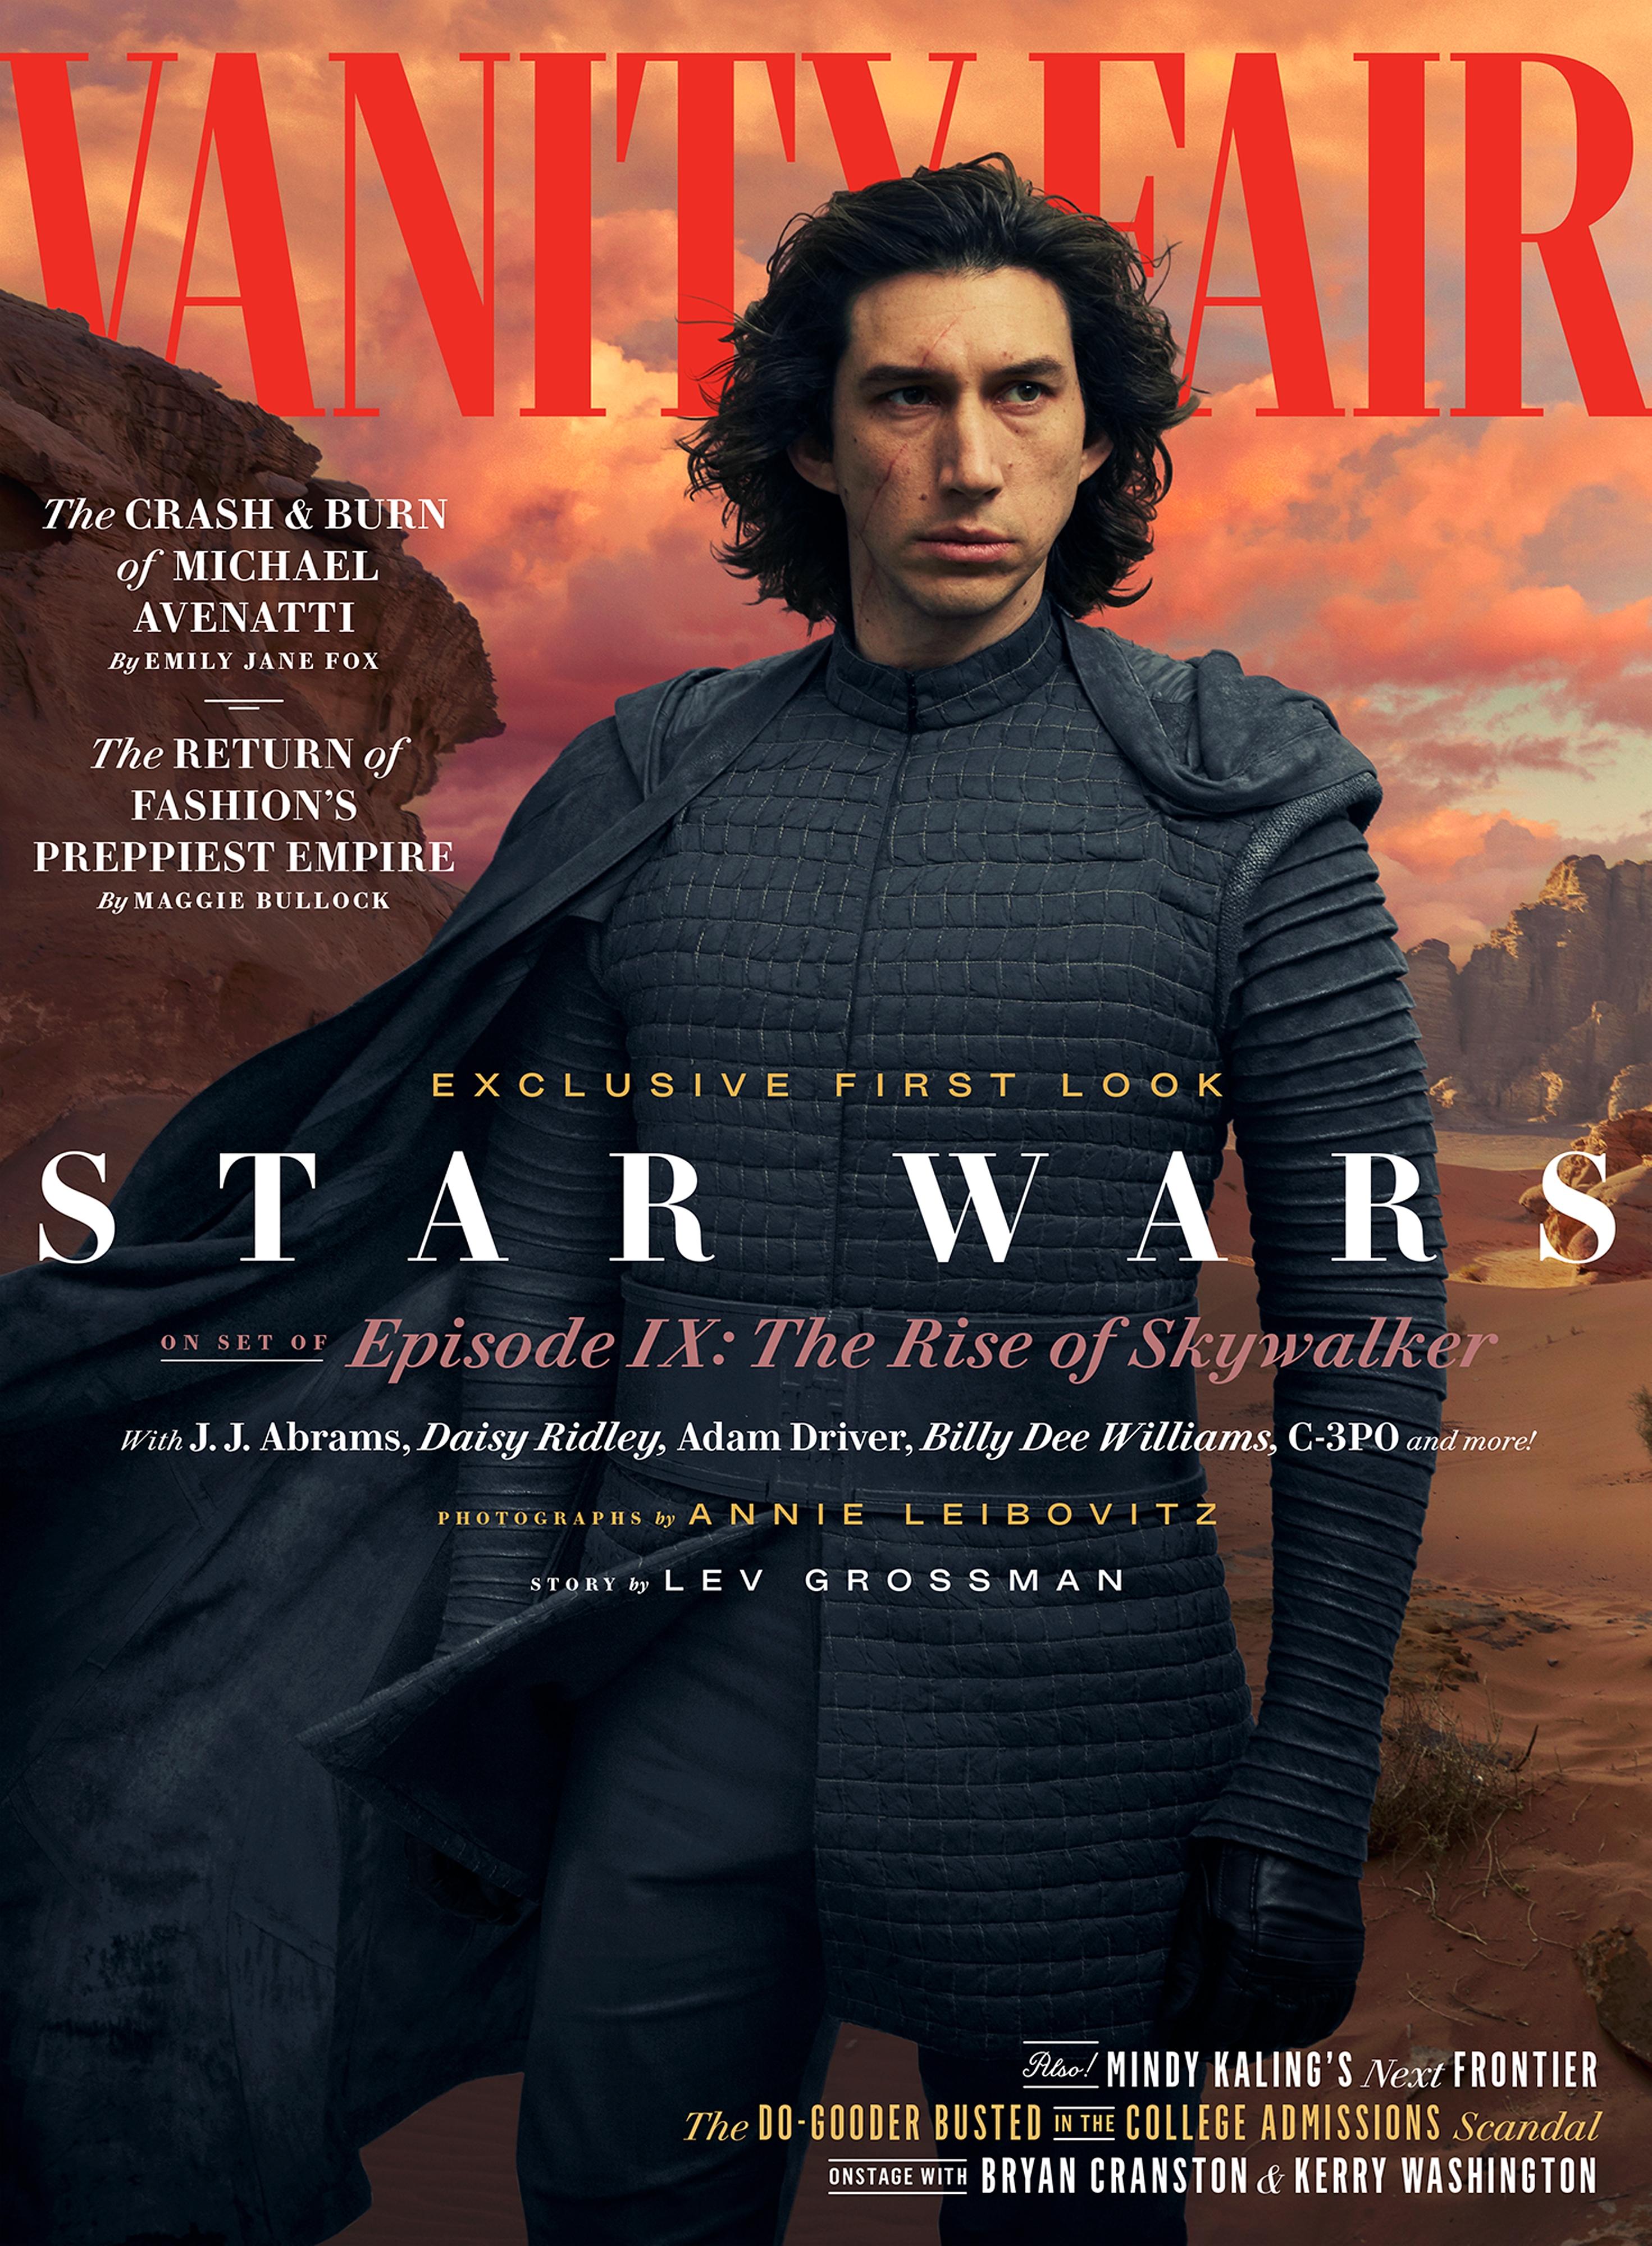 star-wars-the-rise-of-skywalker-vanity-fair-kylo-ren-cover-exclusive-hi-resolution-image-by-annie-leibovitz.jpg